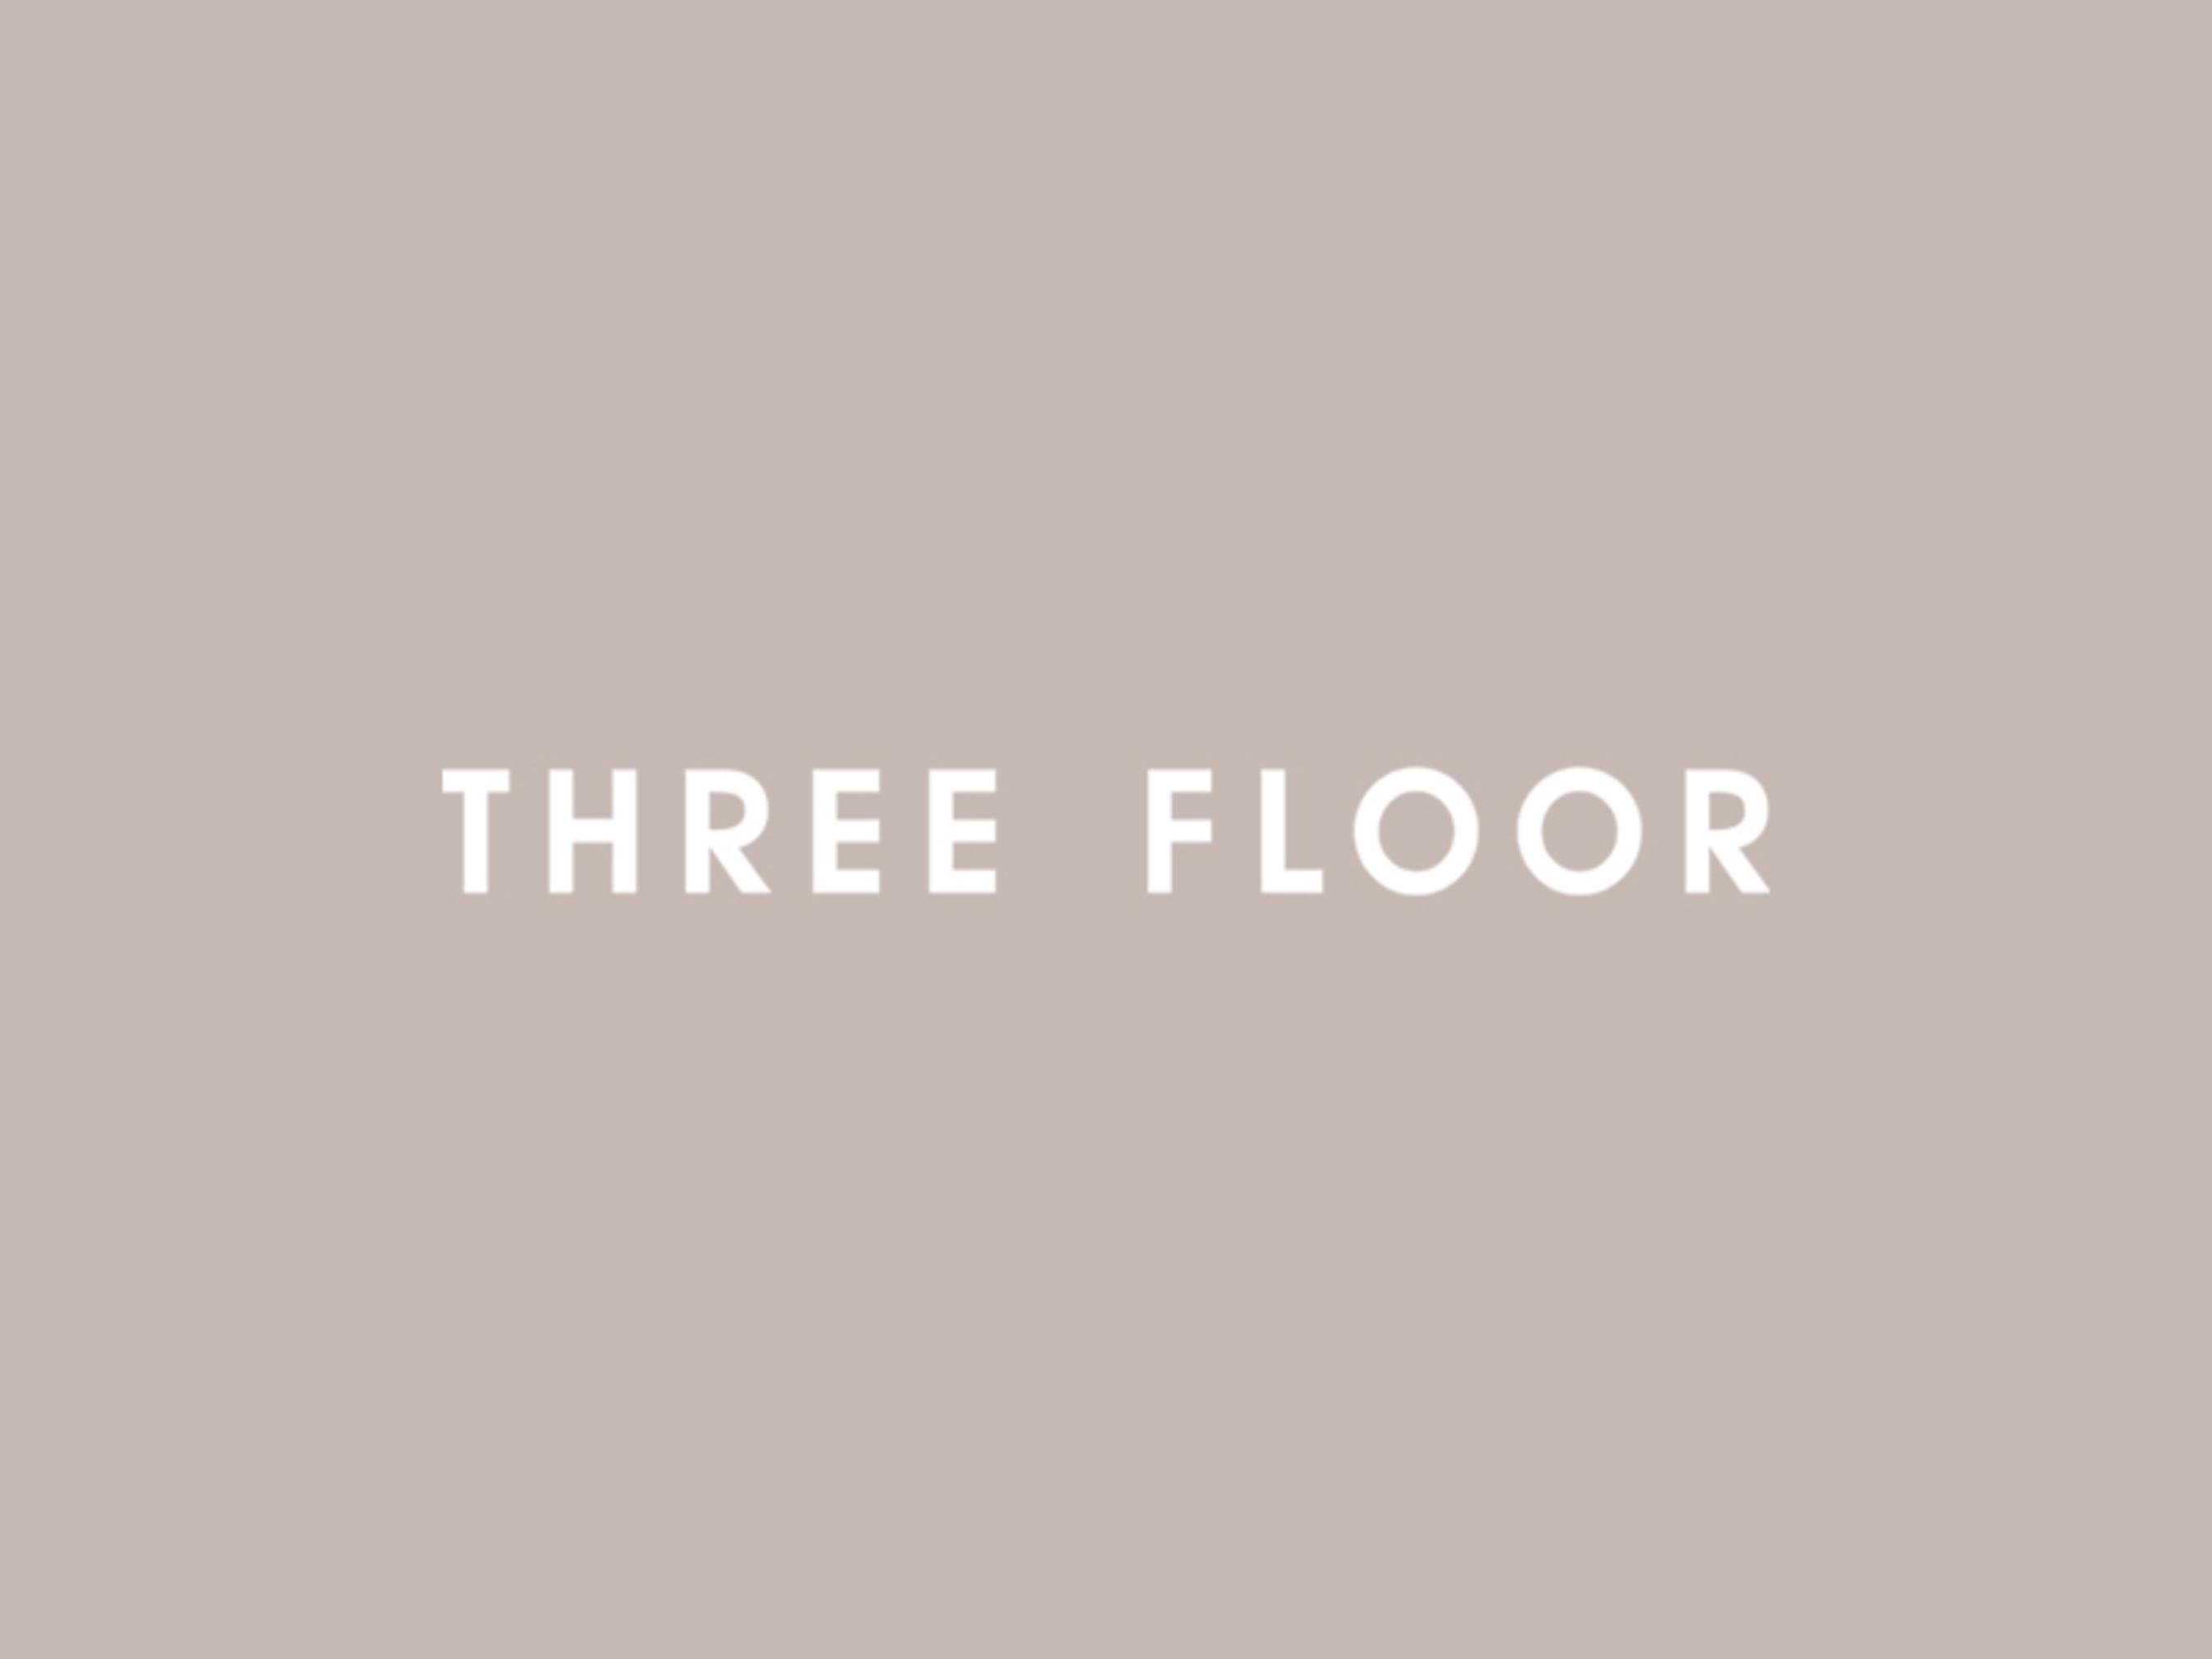 THREE FLOOR Logo (PRNewsFoto/THREE FLOOR)